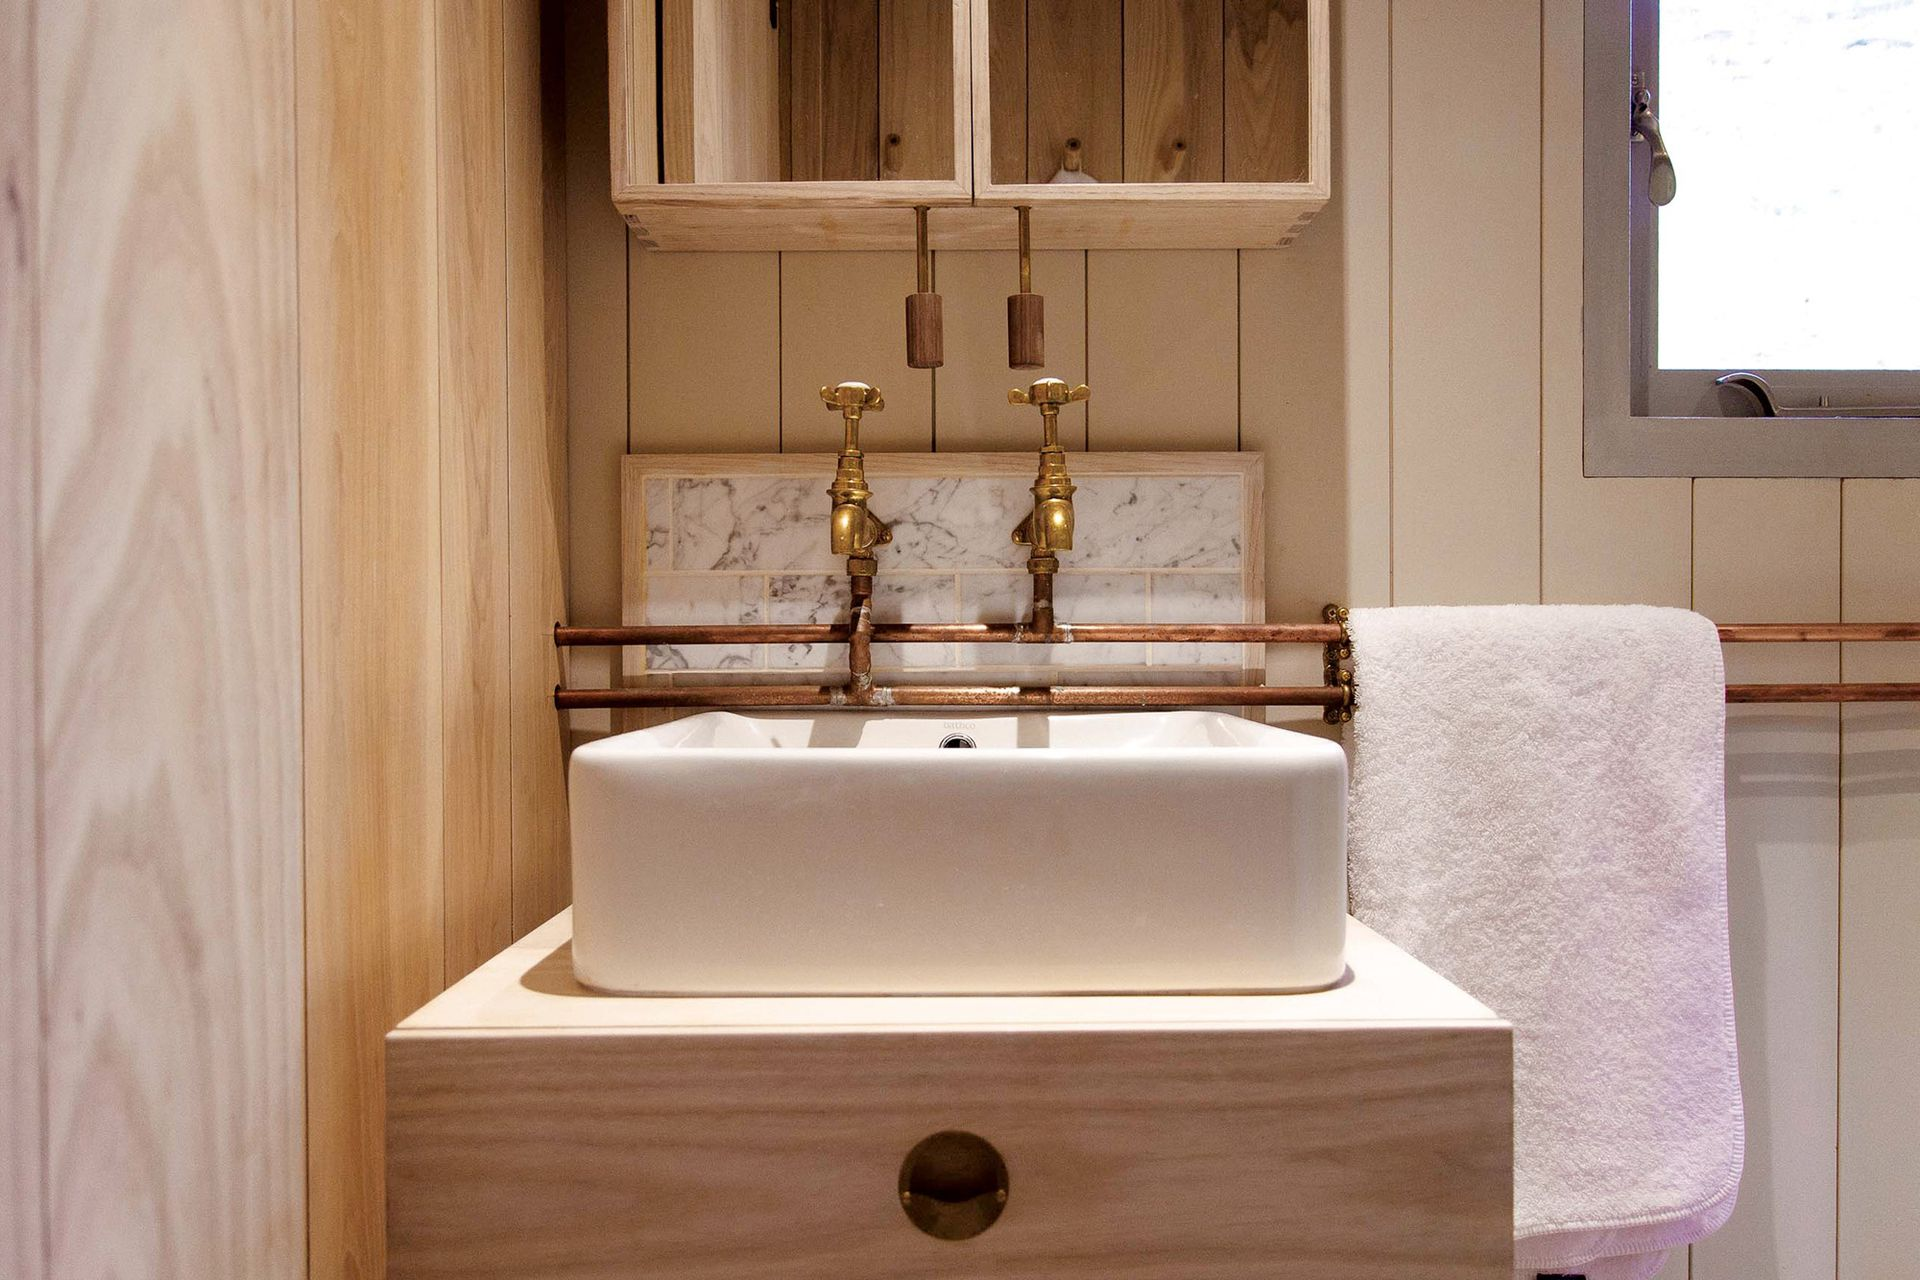 En el baño, bacha rectangular sobre un mueble de madera.